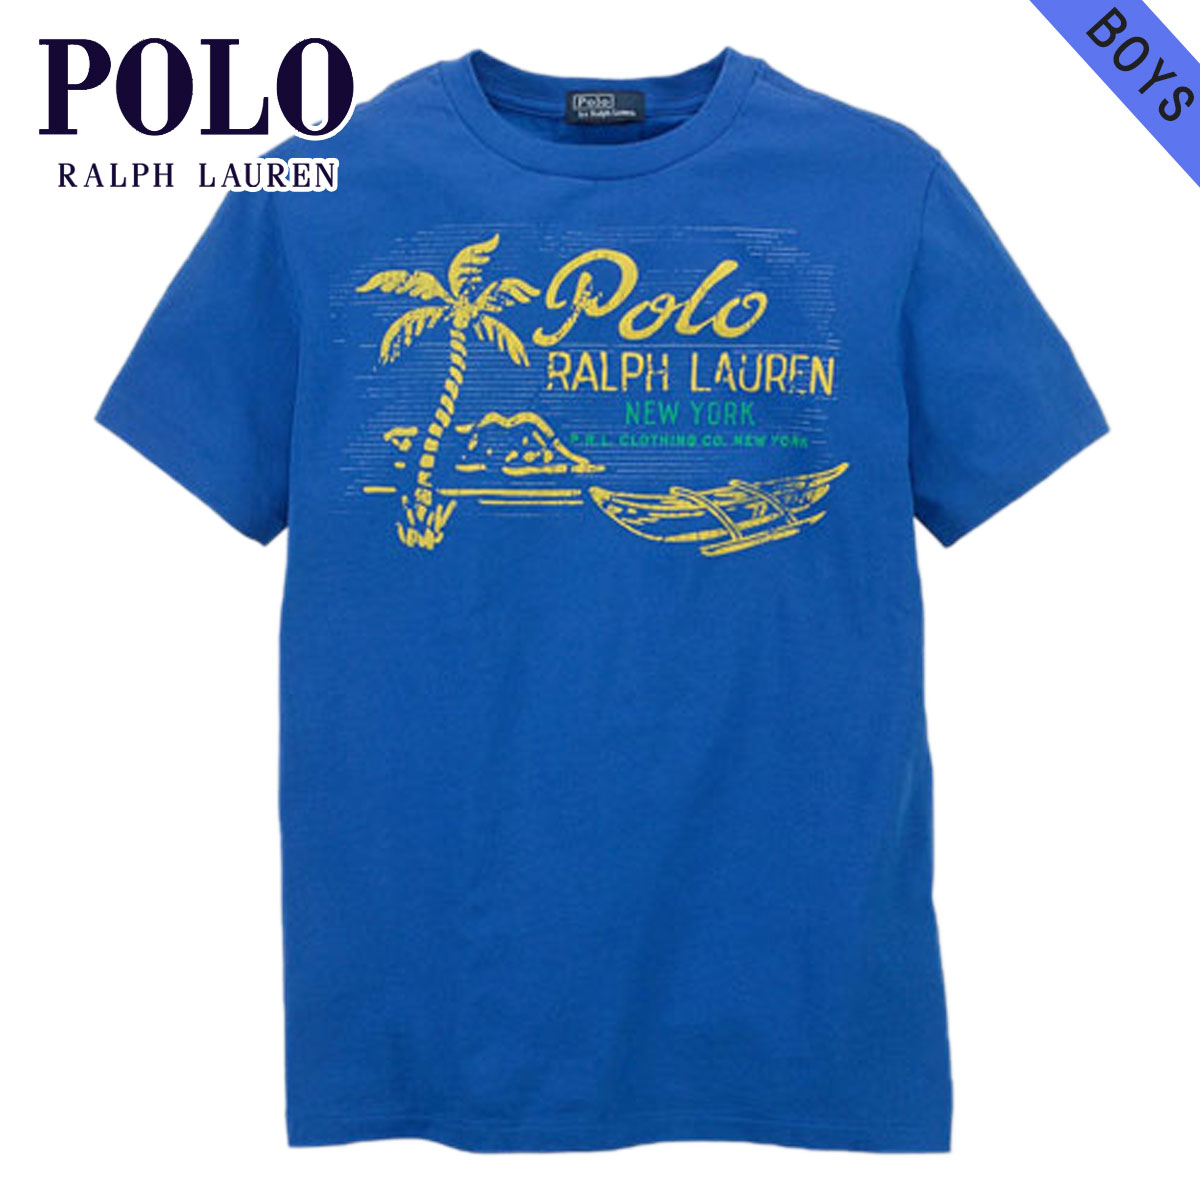 8fe8bc400 ... greece rakuten ichiba shop mixon poloralflorenkids polo ralph lauren  children genuine kids clothing boys short sleeve